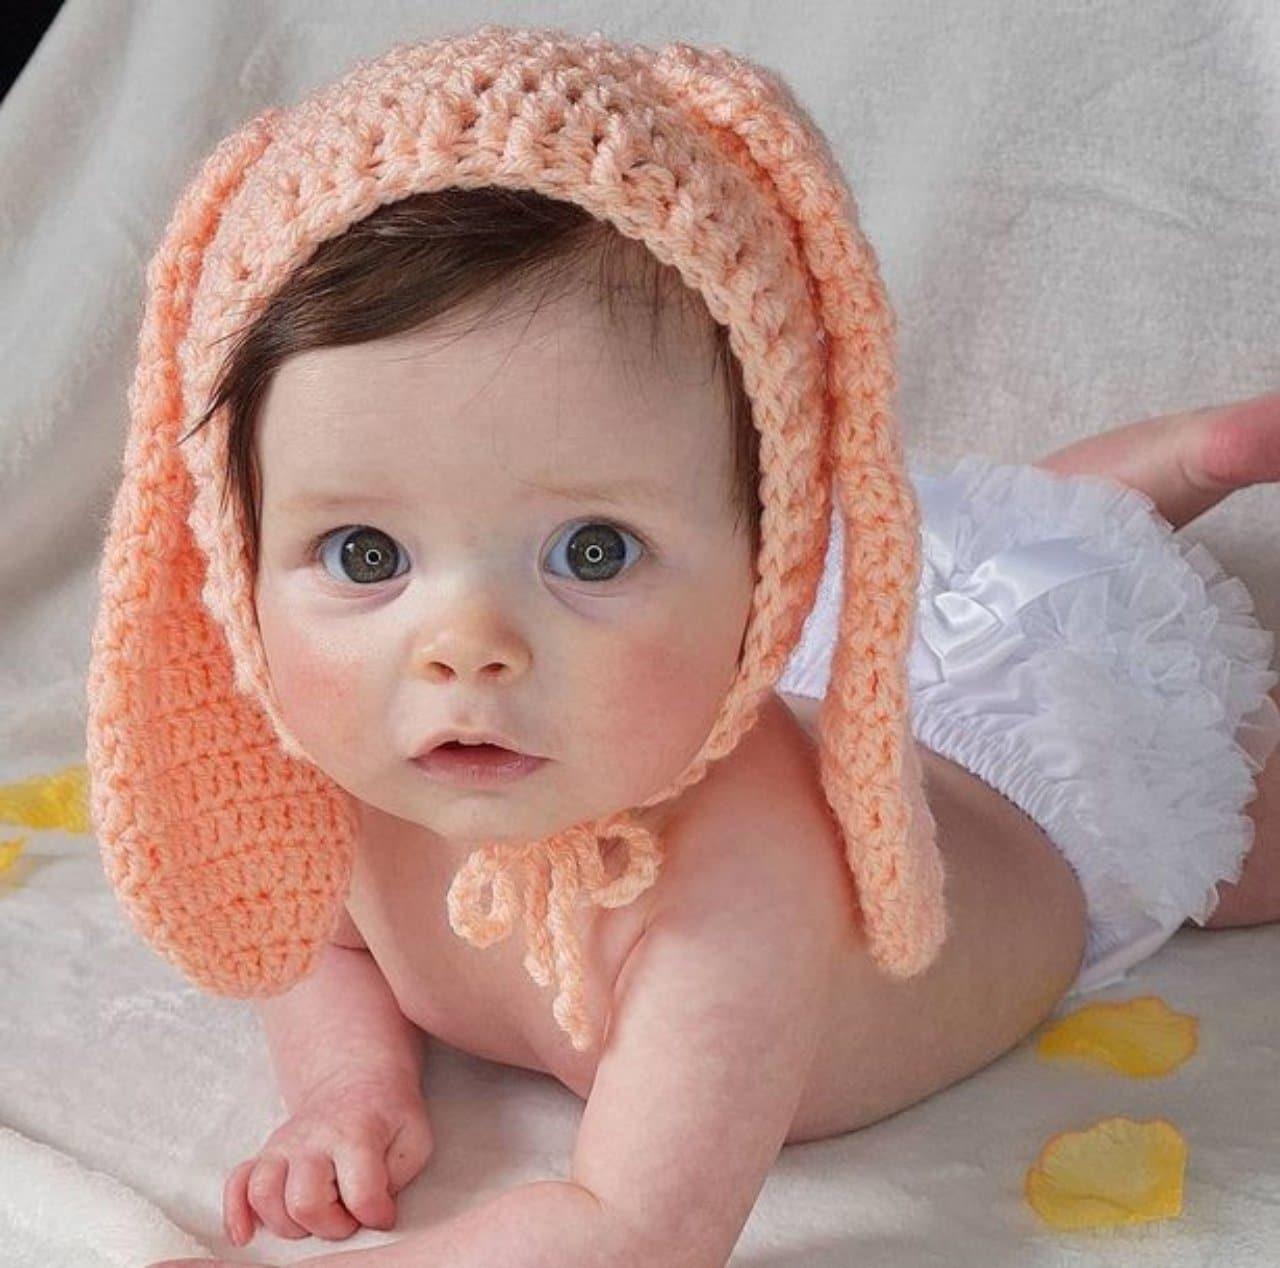 bebé internet embarazada esperma